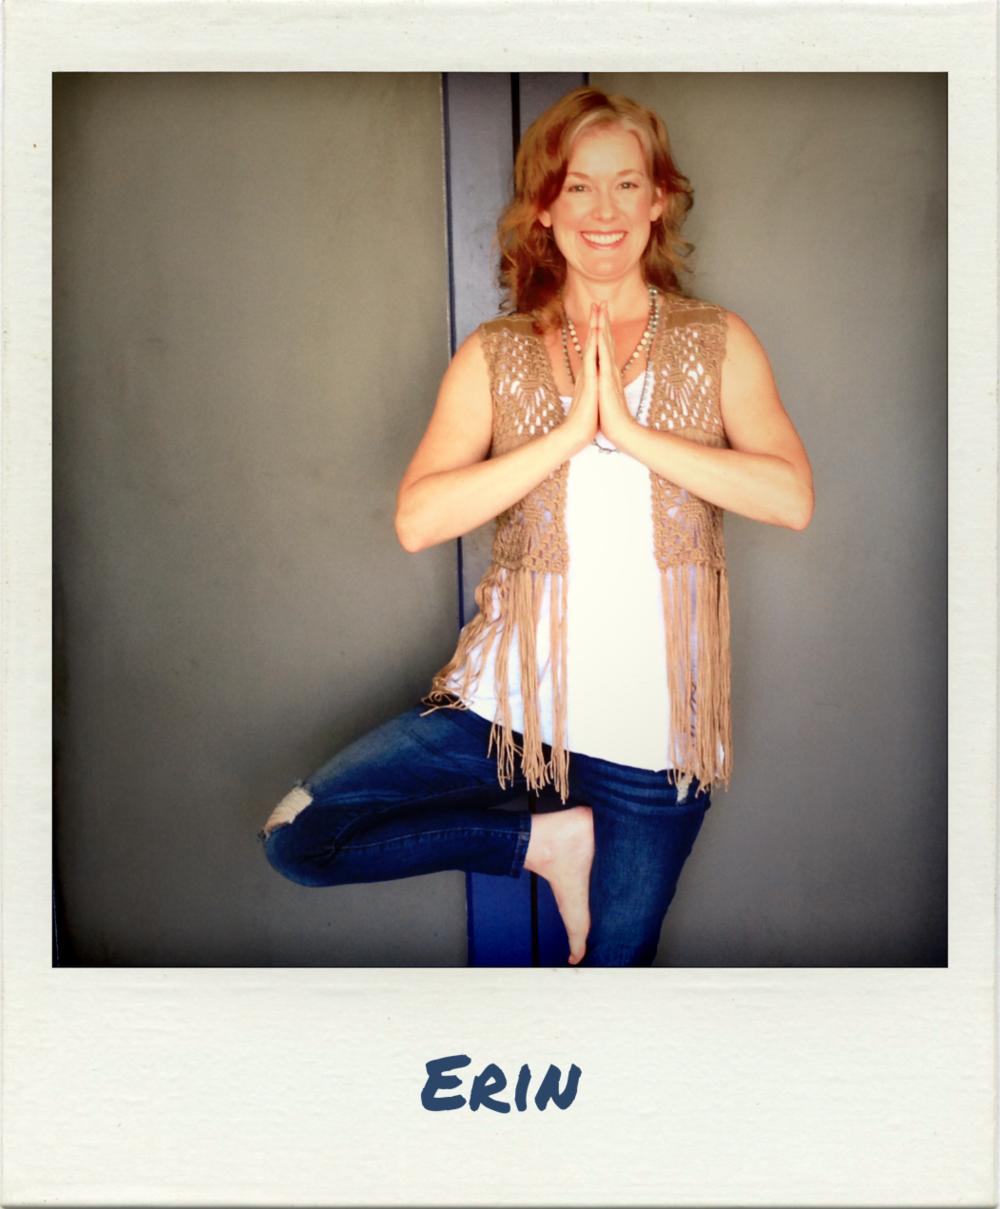 Erin Easterly